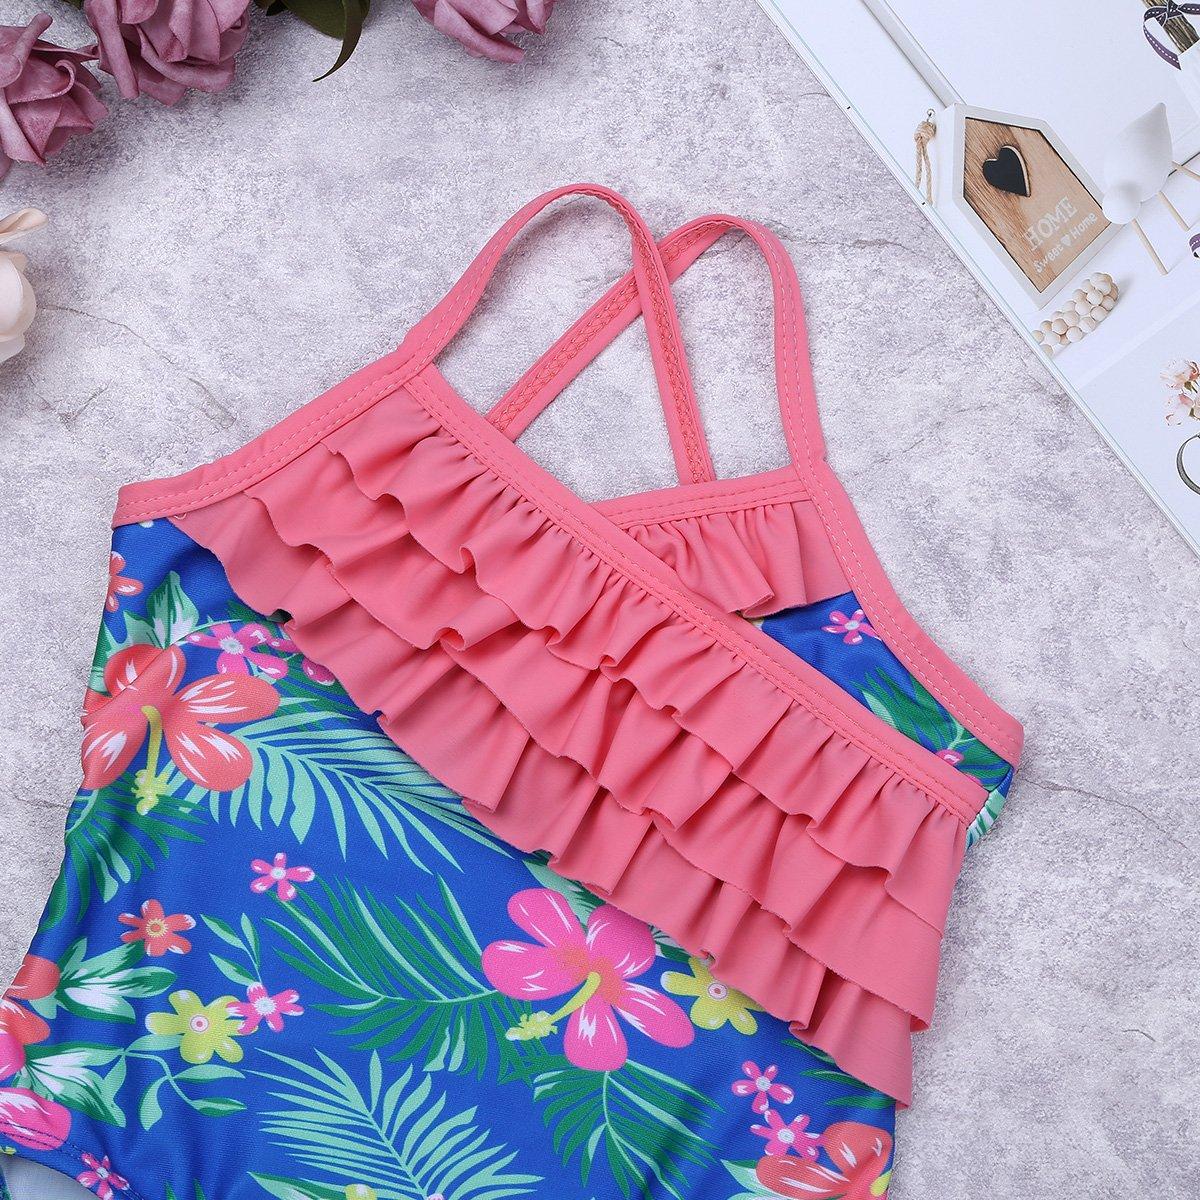 FEESHOW Toddler Baby Girls One Piece Swimsuit Polka Dot Swimwear Bathing Suit